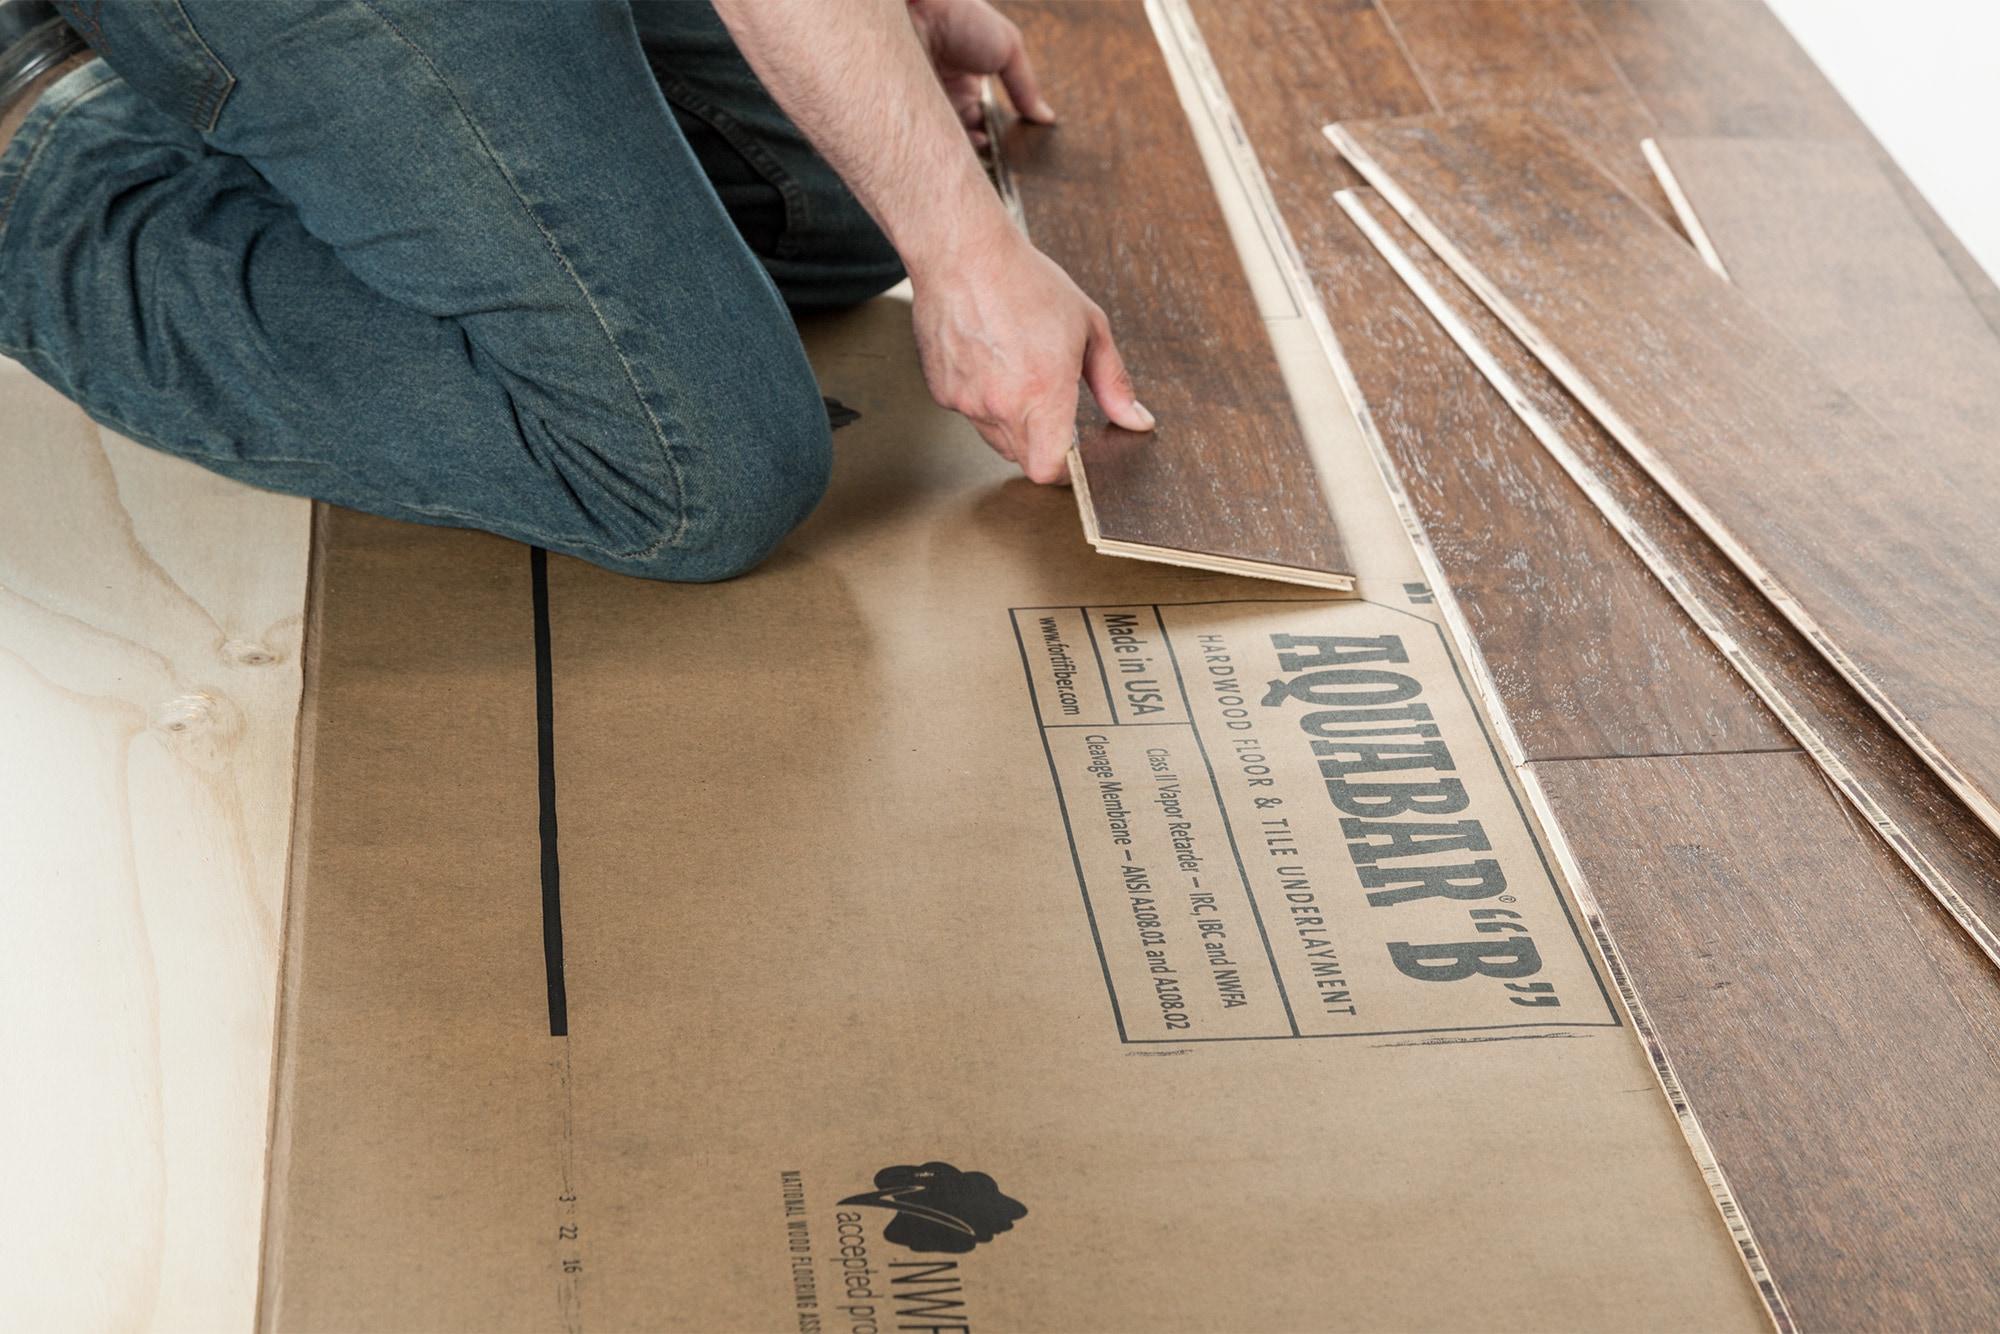 Aquabar NWFA Approved Hardwood Underlayment Underlayment for Wood